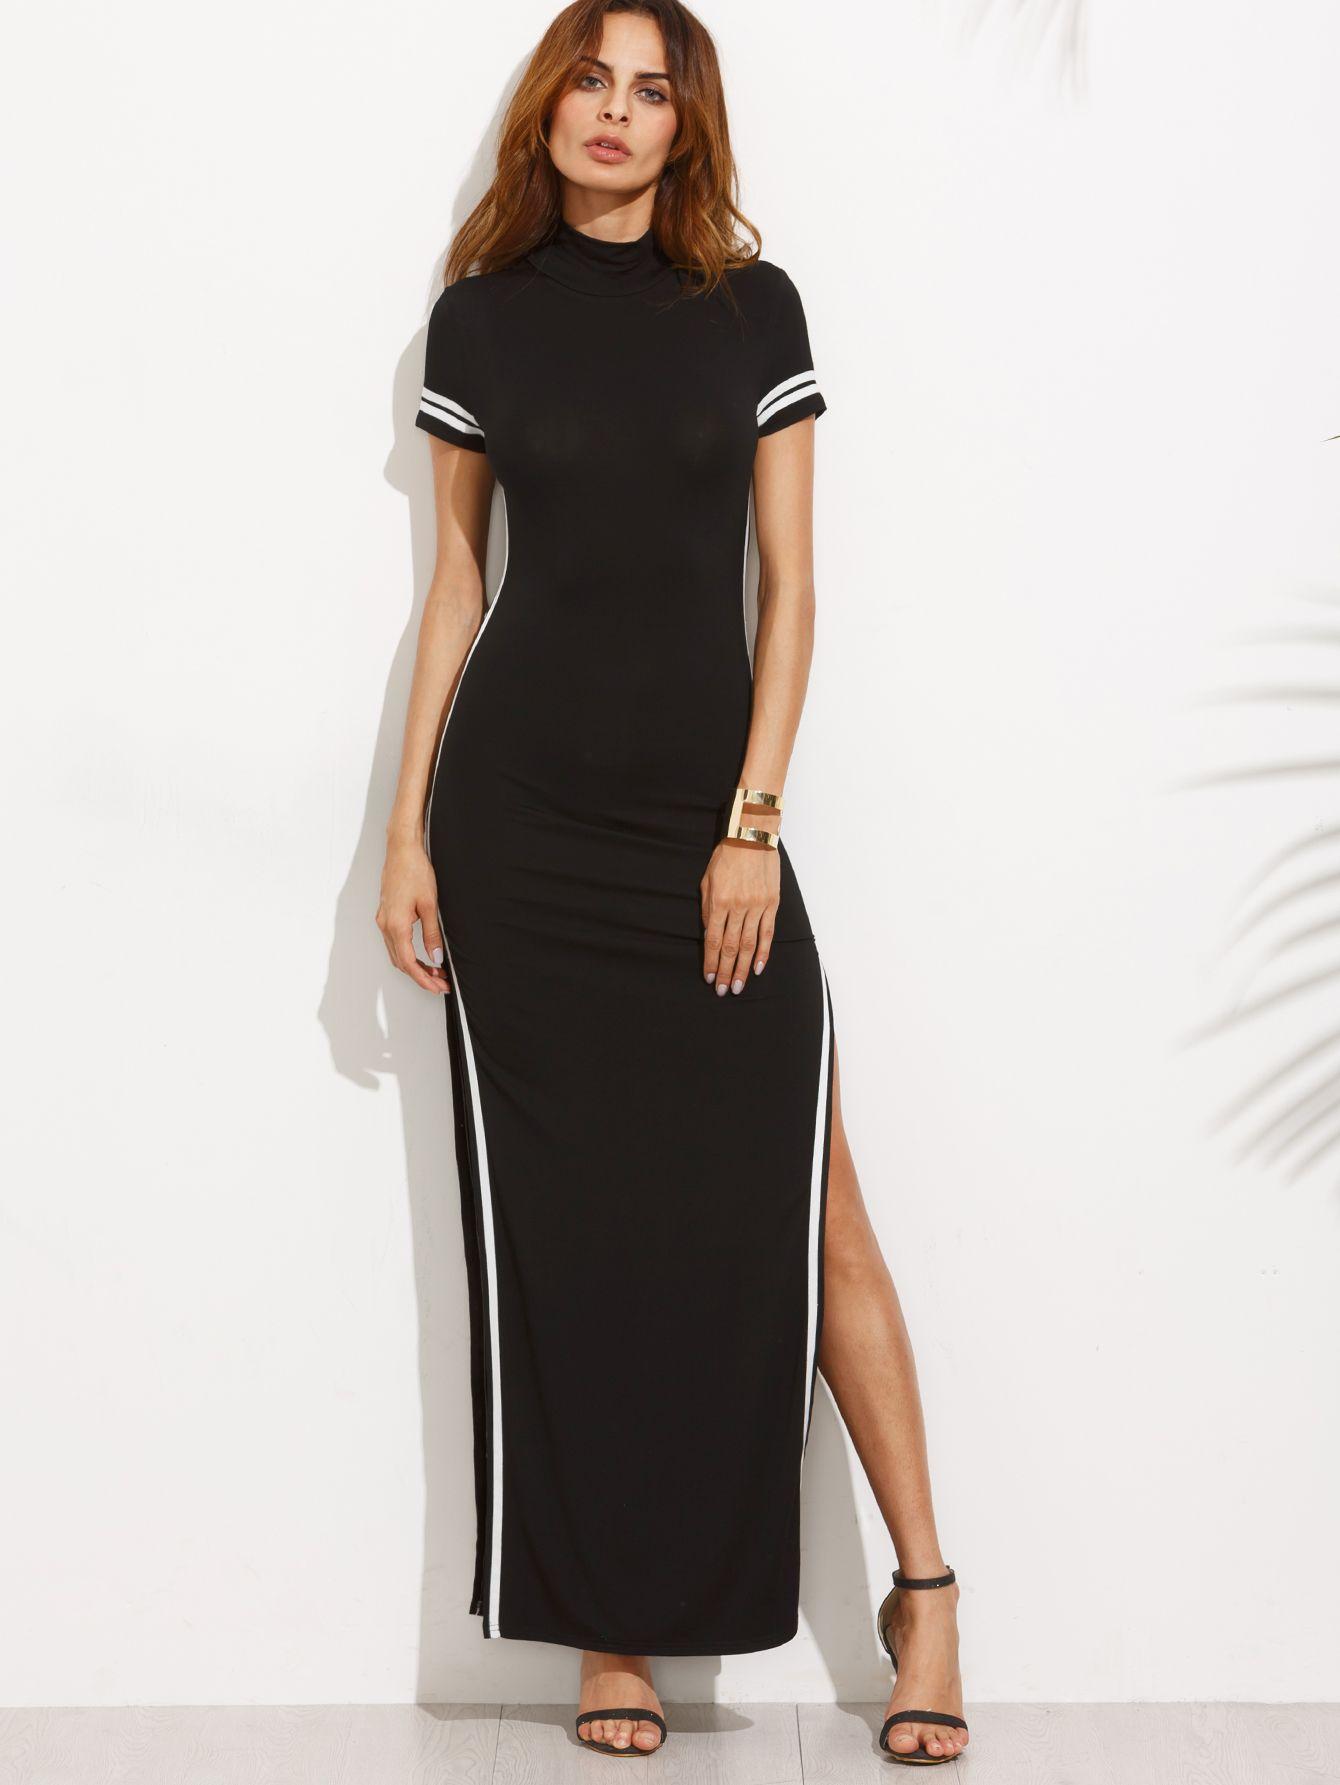 5aea1dff618 Robe longue fendue manche courte motif rayures - Noir - SheIn ...